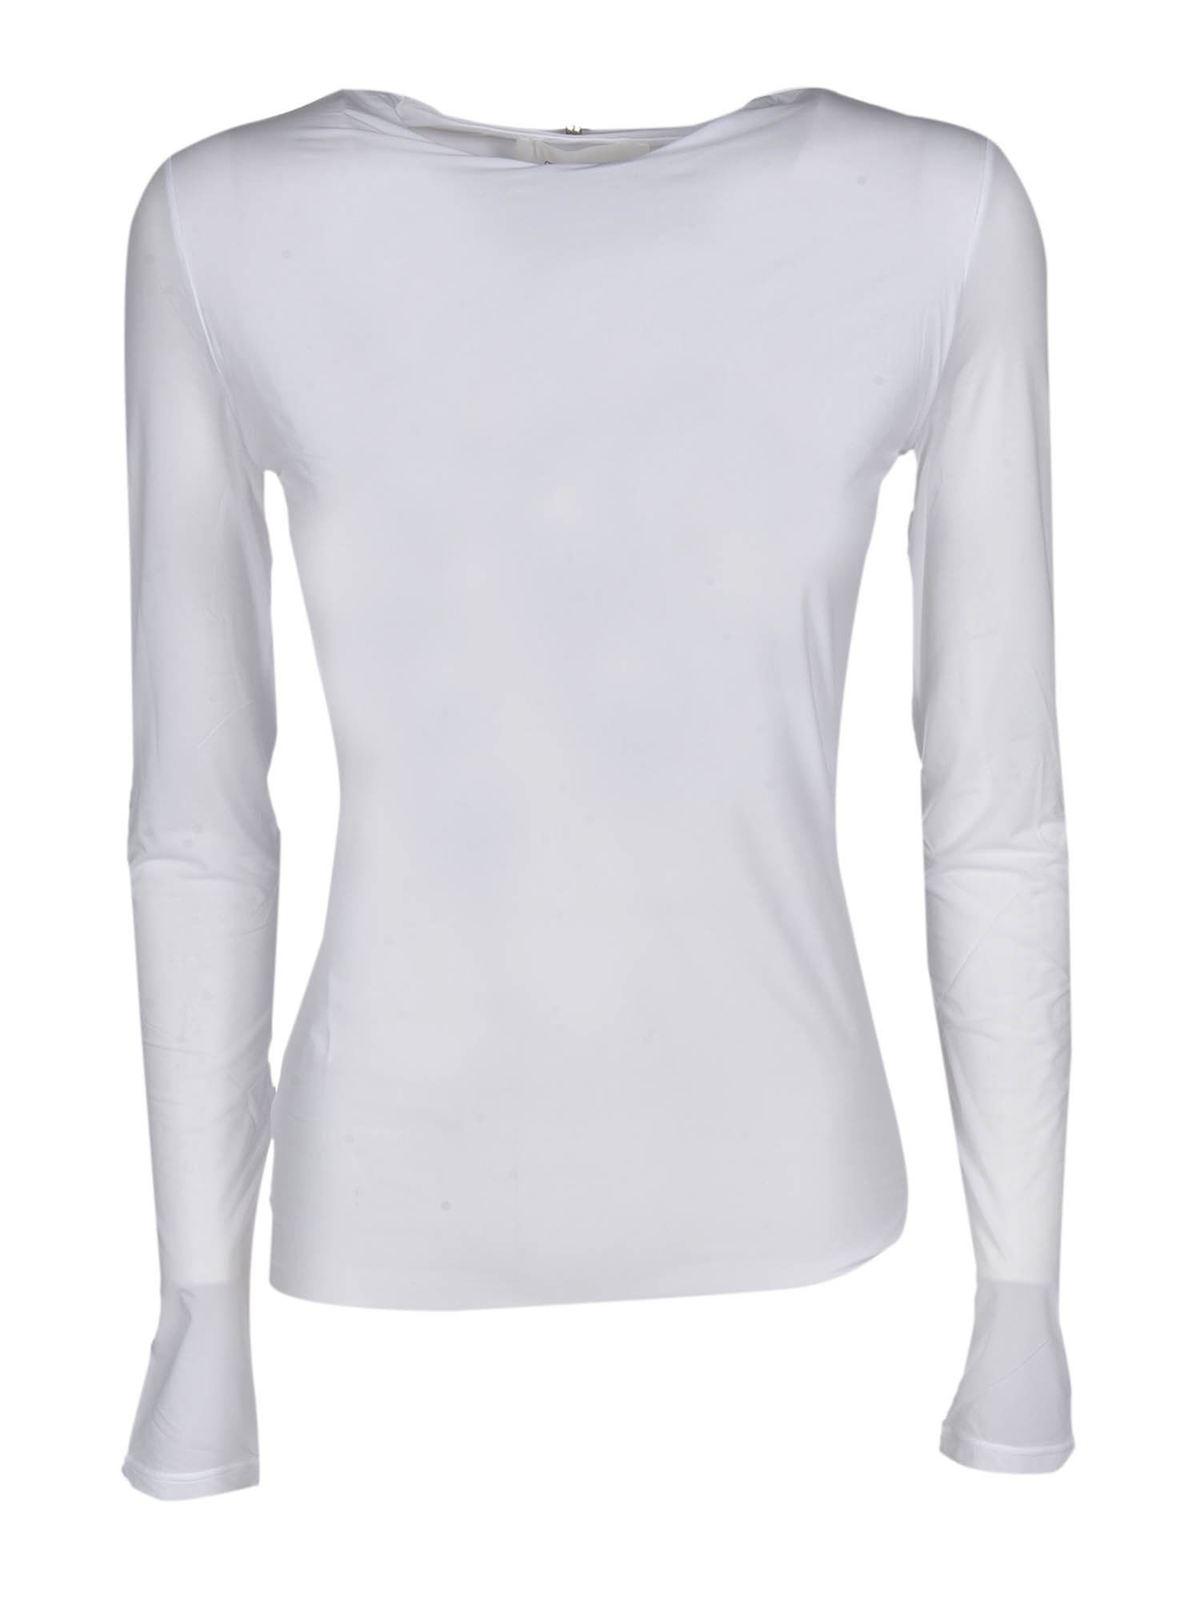 Sportmax ANZIO T-SHIRT IN WHITE